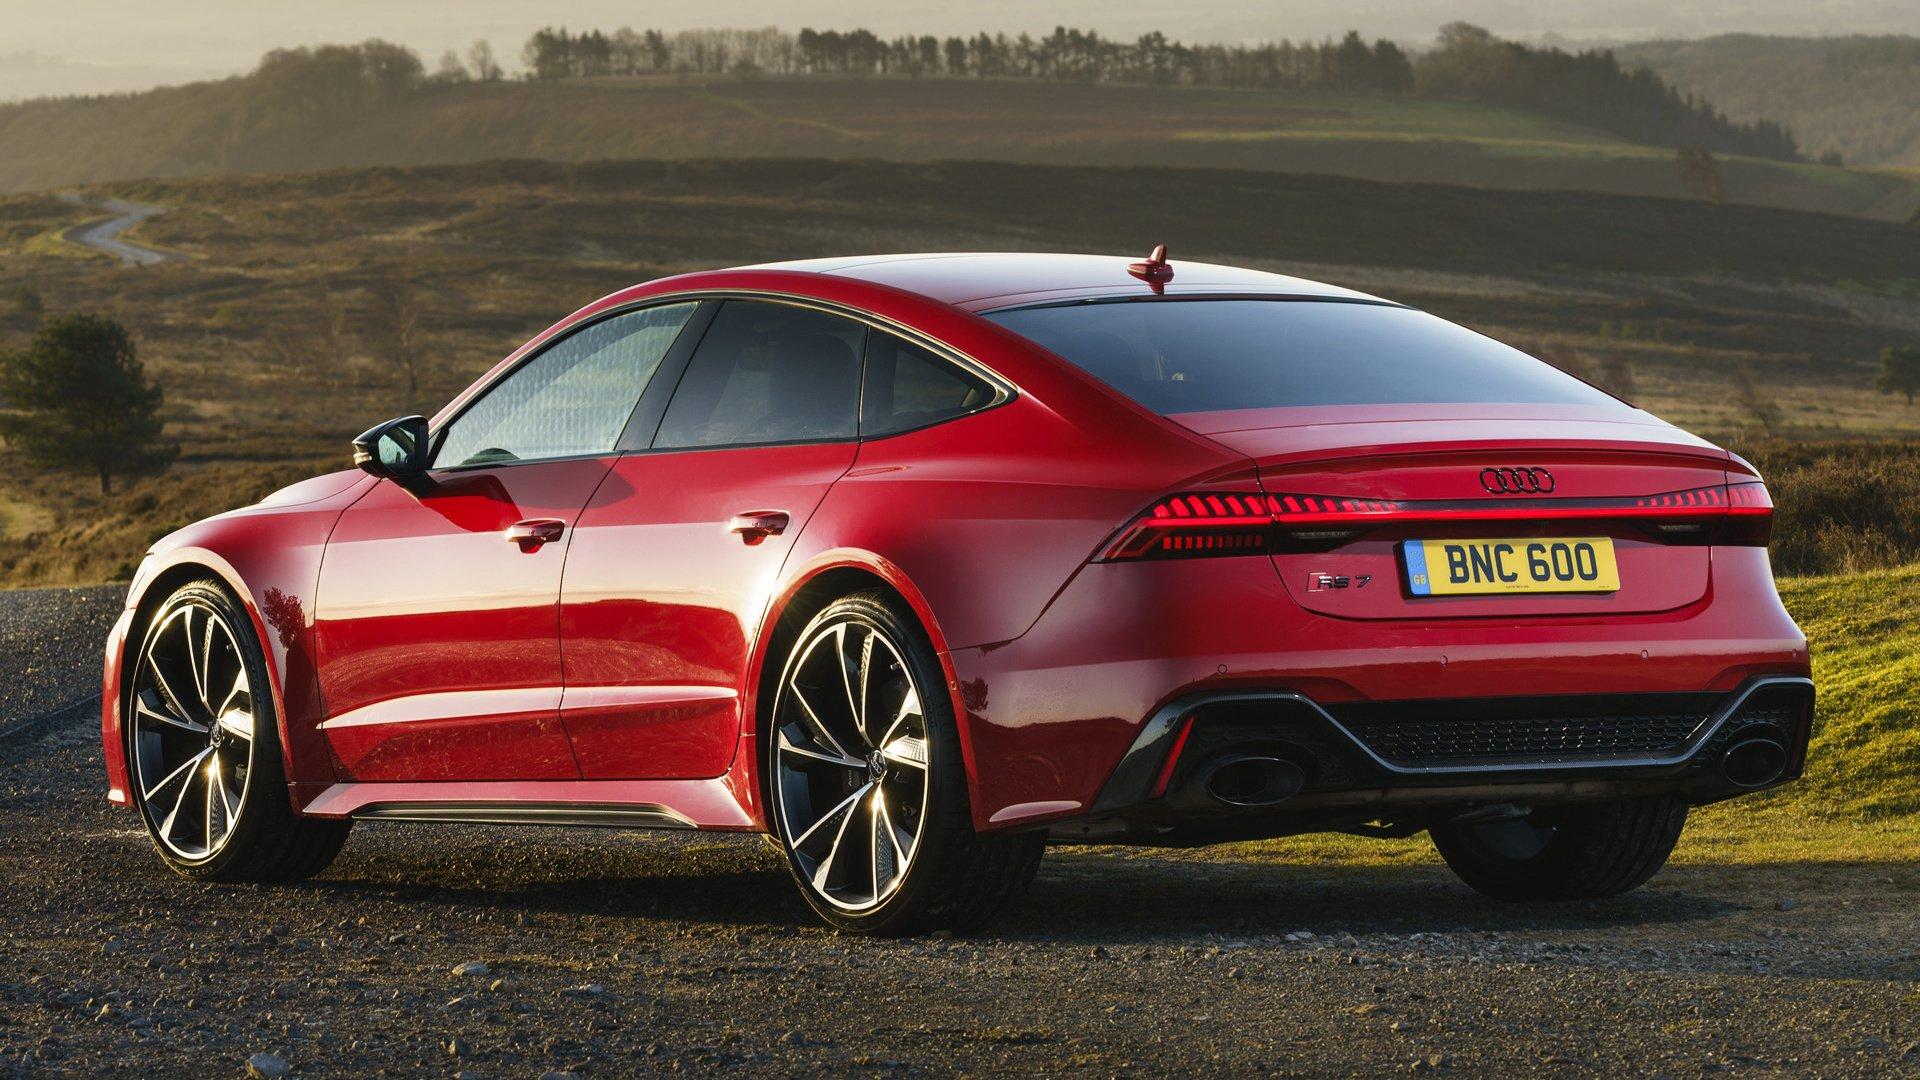 2020 Audi Rs7 Sportback Fond D Ecran Hd Arriere Plan 1920x1080 Id 1070841 Wallpaper Abyss